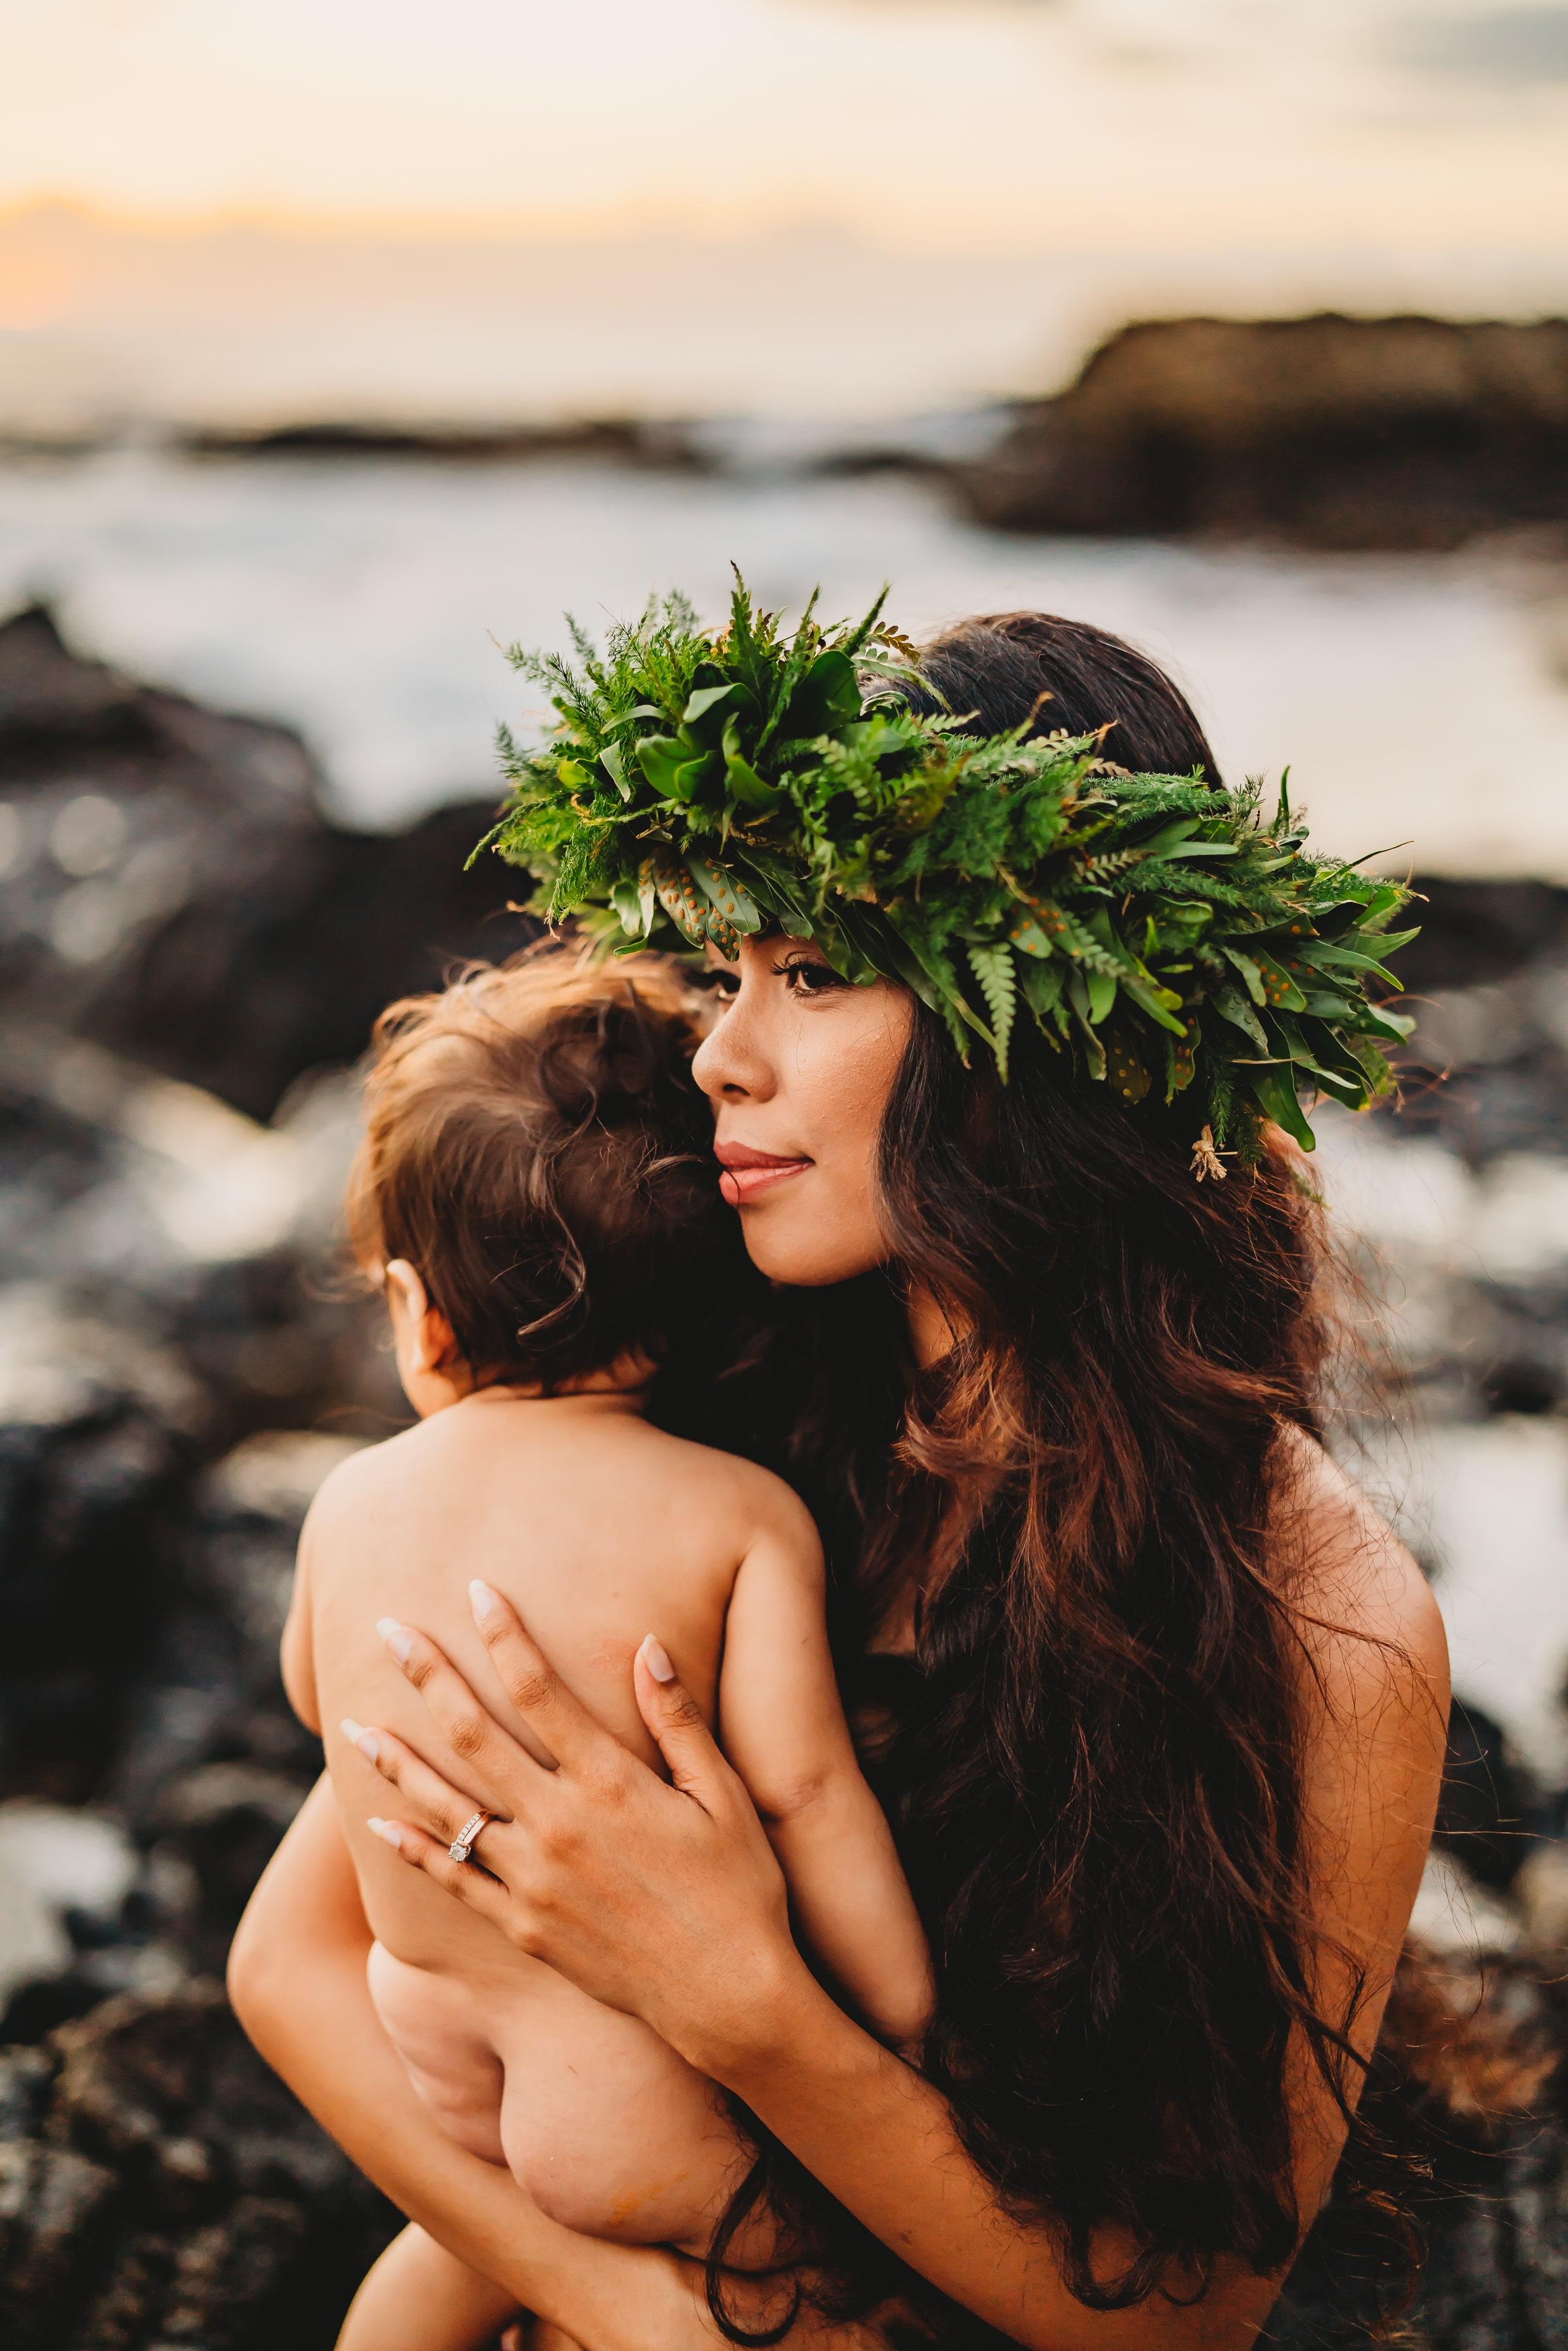 Oahu-Hawaii-Family-Photographer-haku-lei-mother-daughter-beach-session-11.jpg